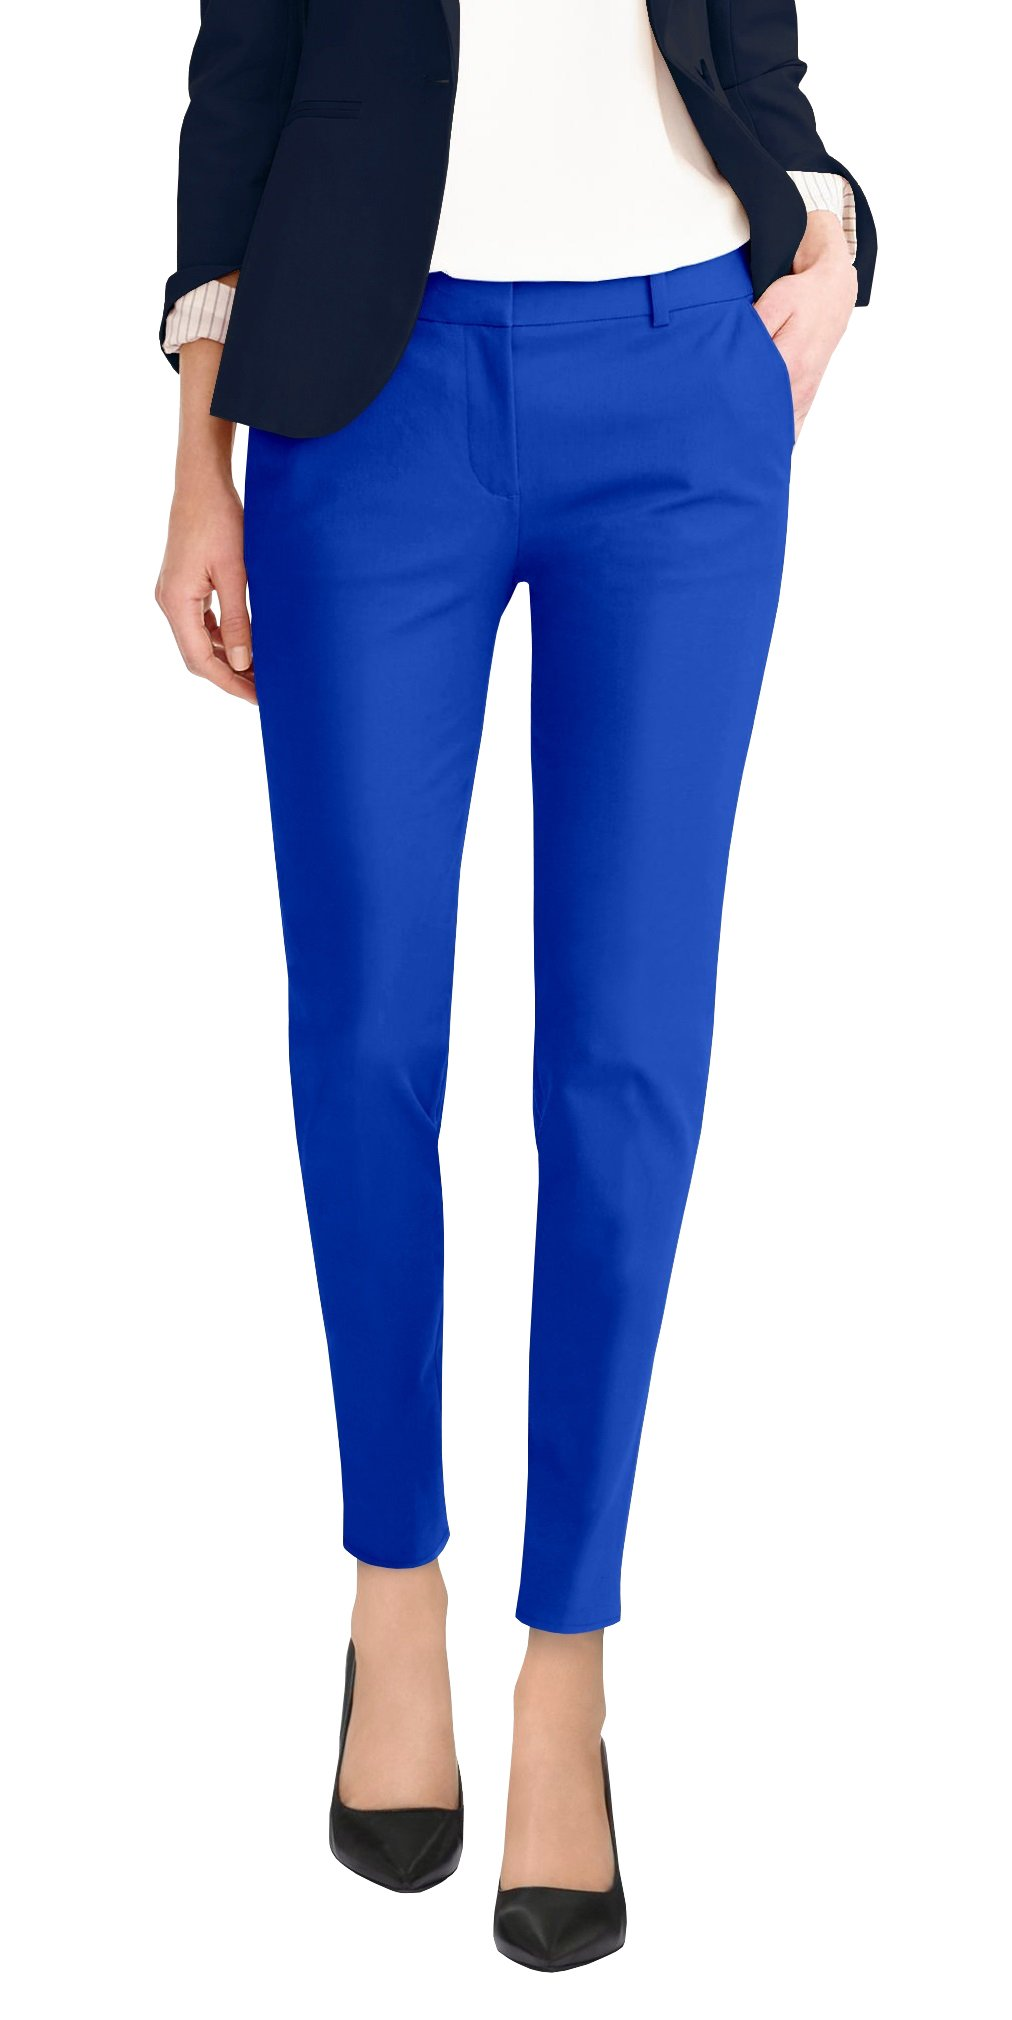 HyBrid & Company Super Comfy Womens Flat Front Stretch Trousers Pants PW31200TT Royal 20